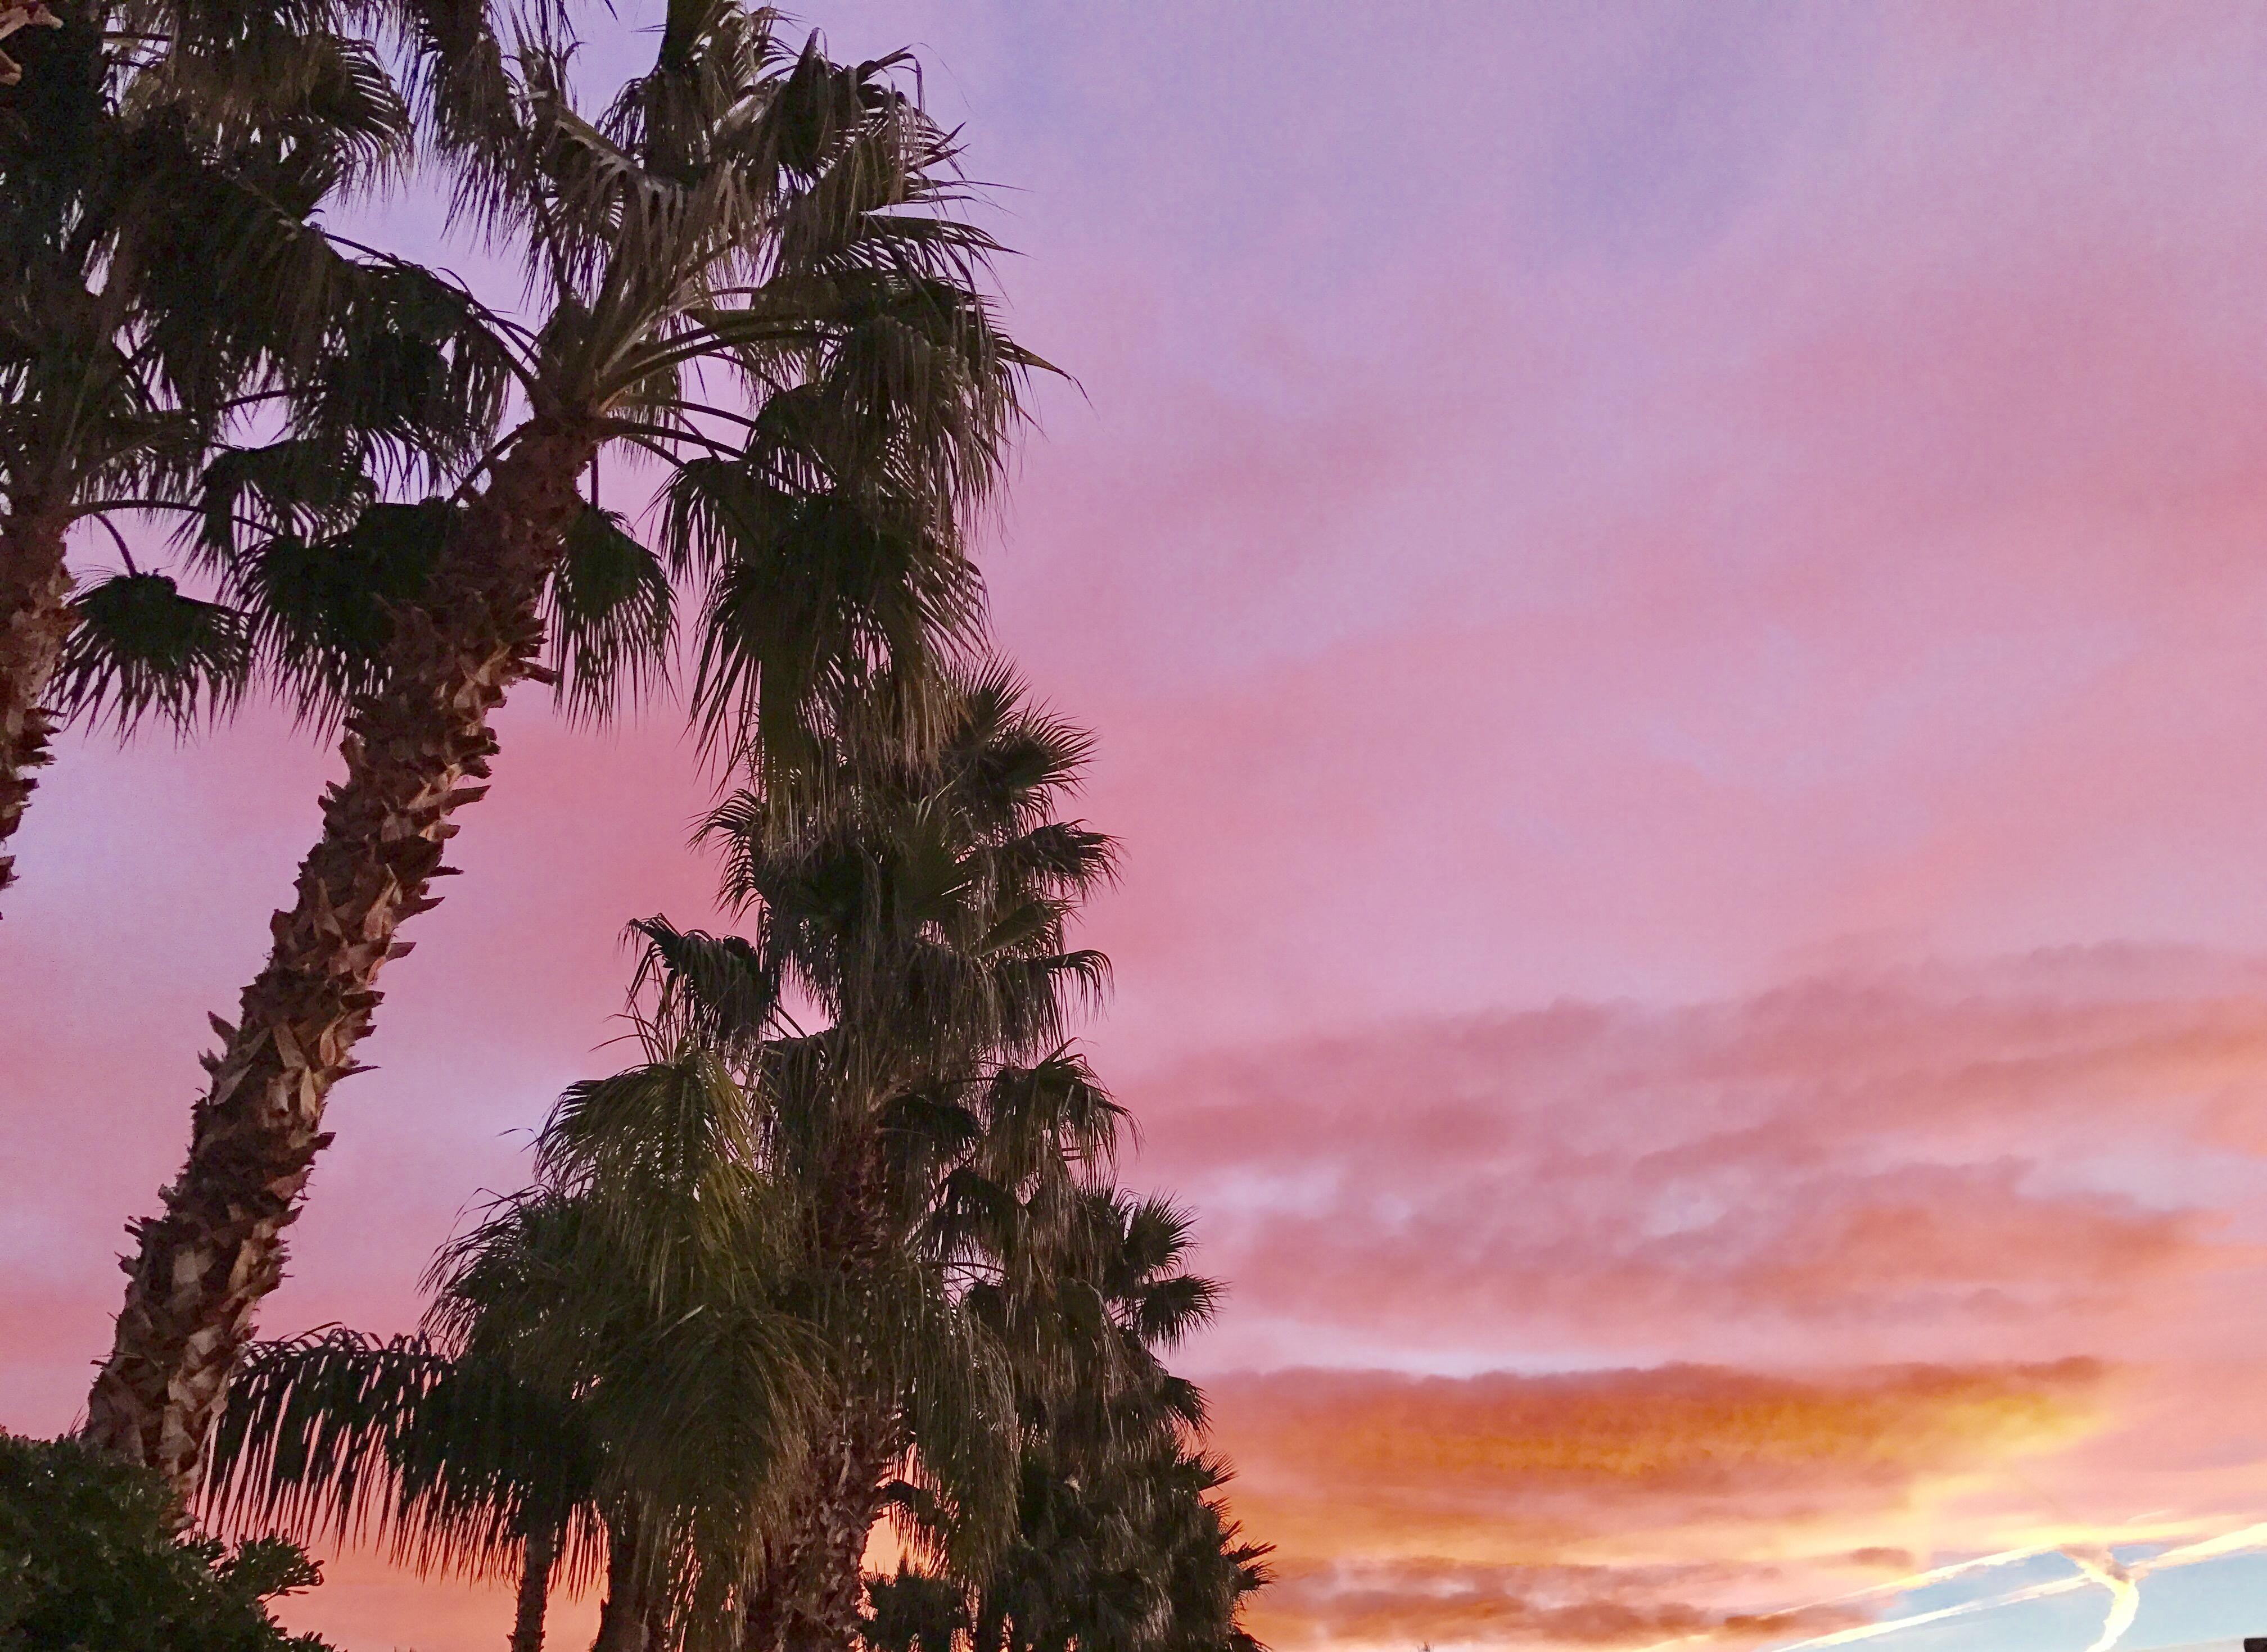 Backyard Palm Trees Las Vegas NV [4032x2939] [OC]